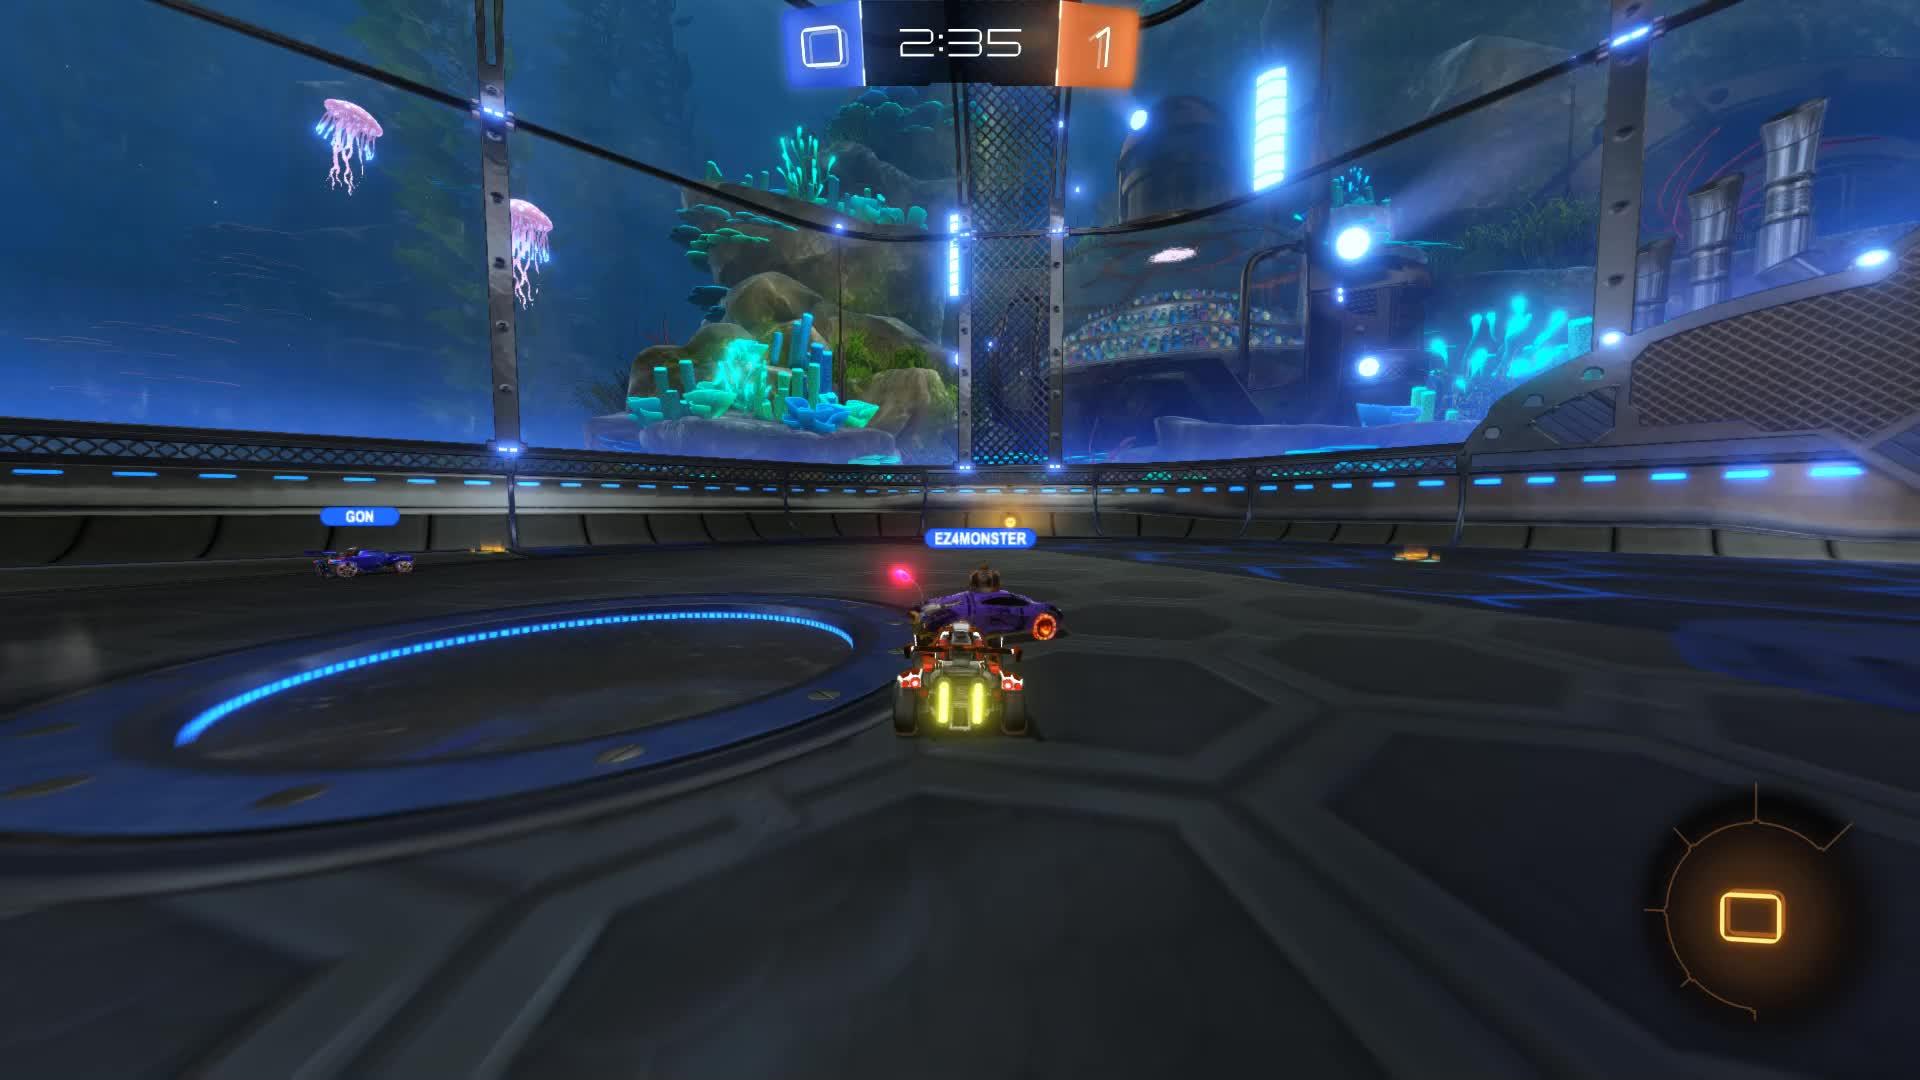 Gif Your Game, GifYourGame, Goal, Rocket League, RocketLeague, Squash, Goal 2: Squash GIFs